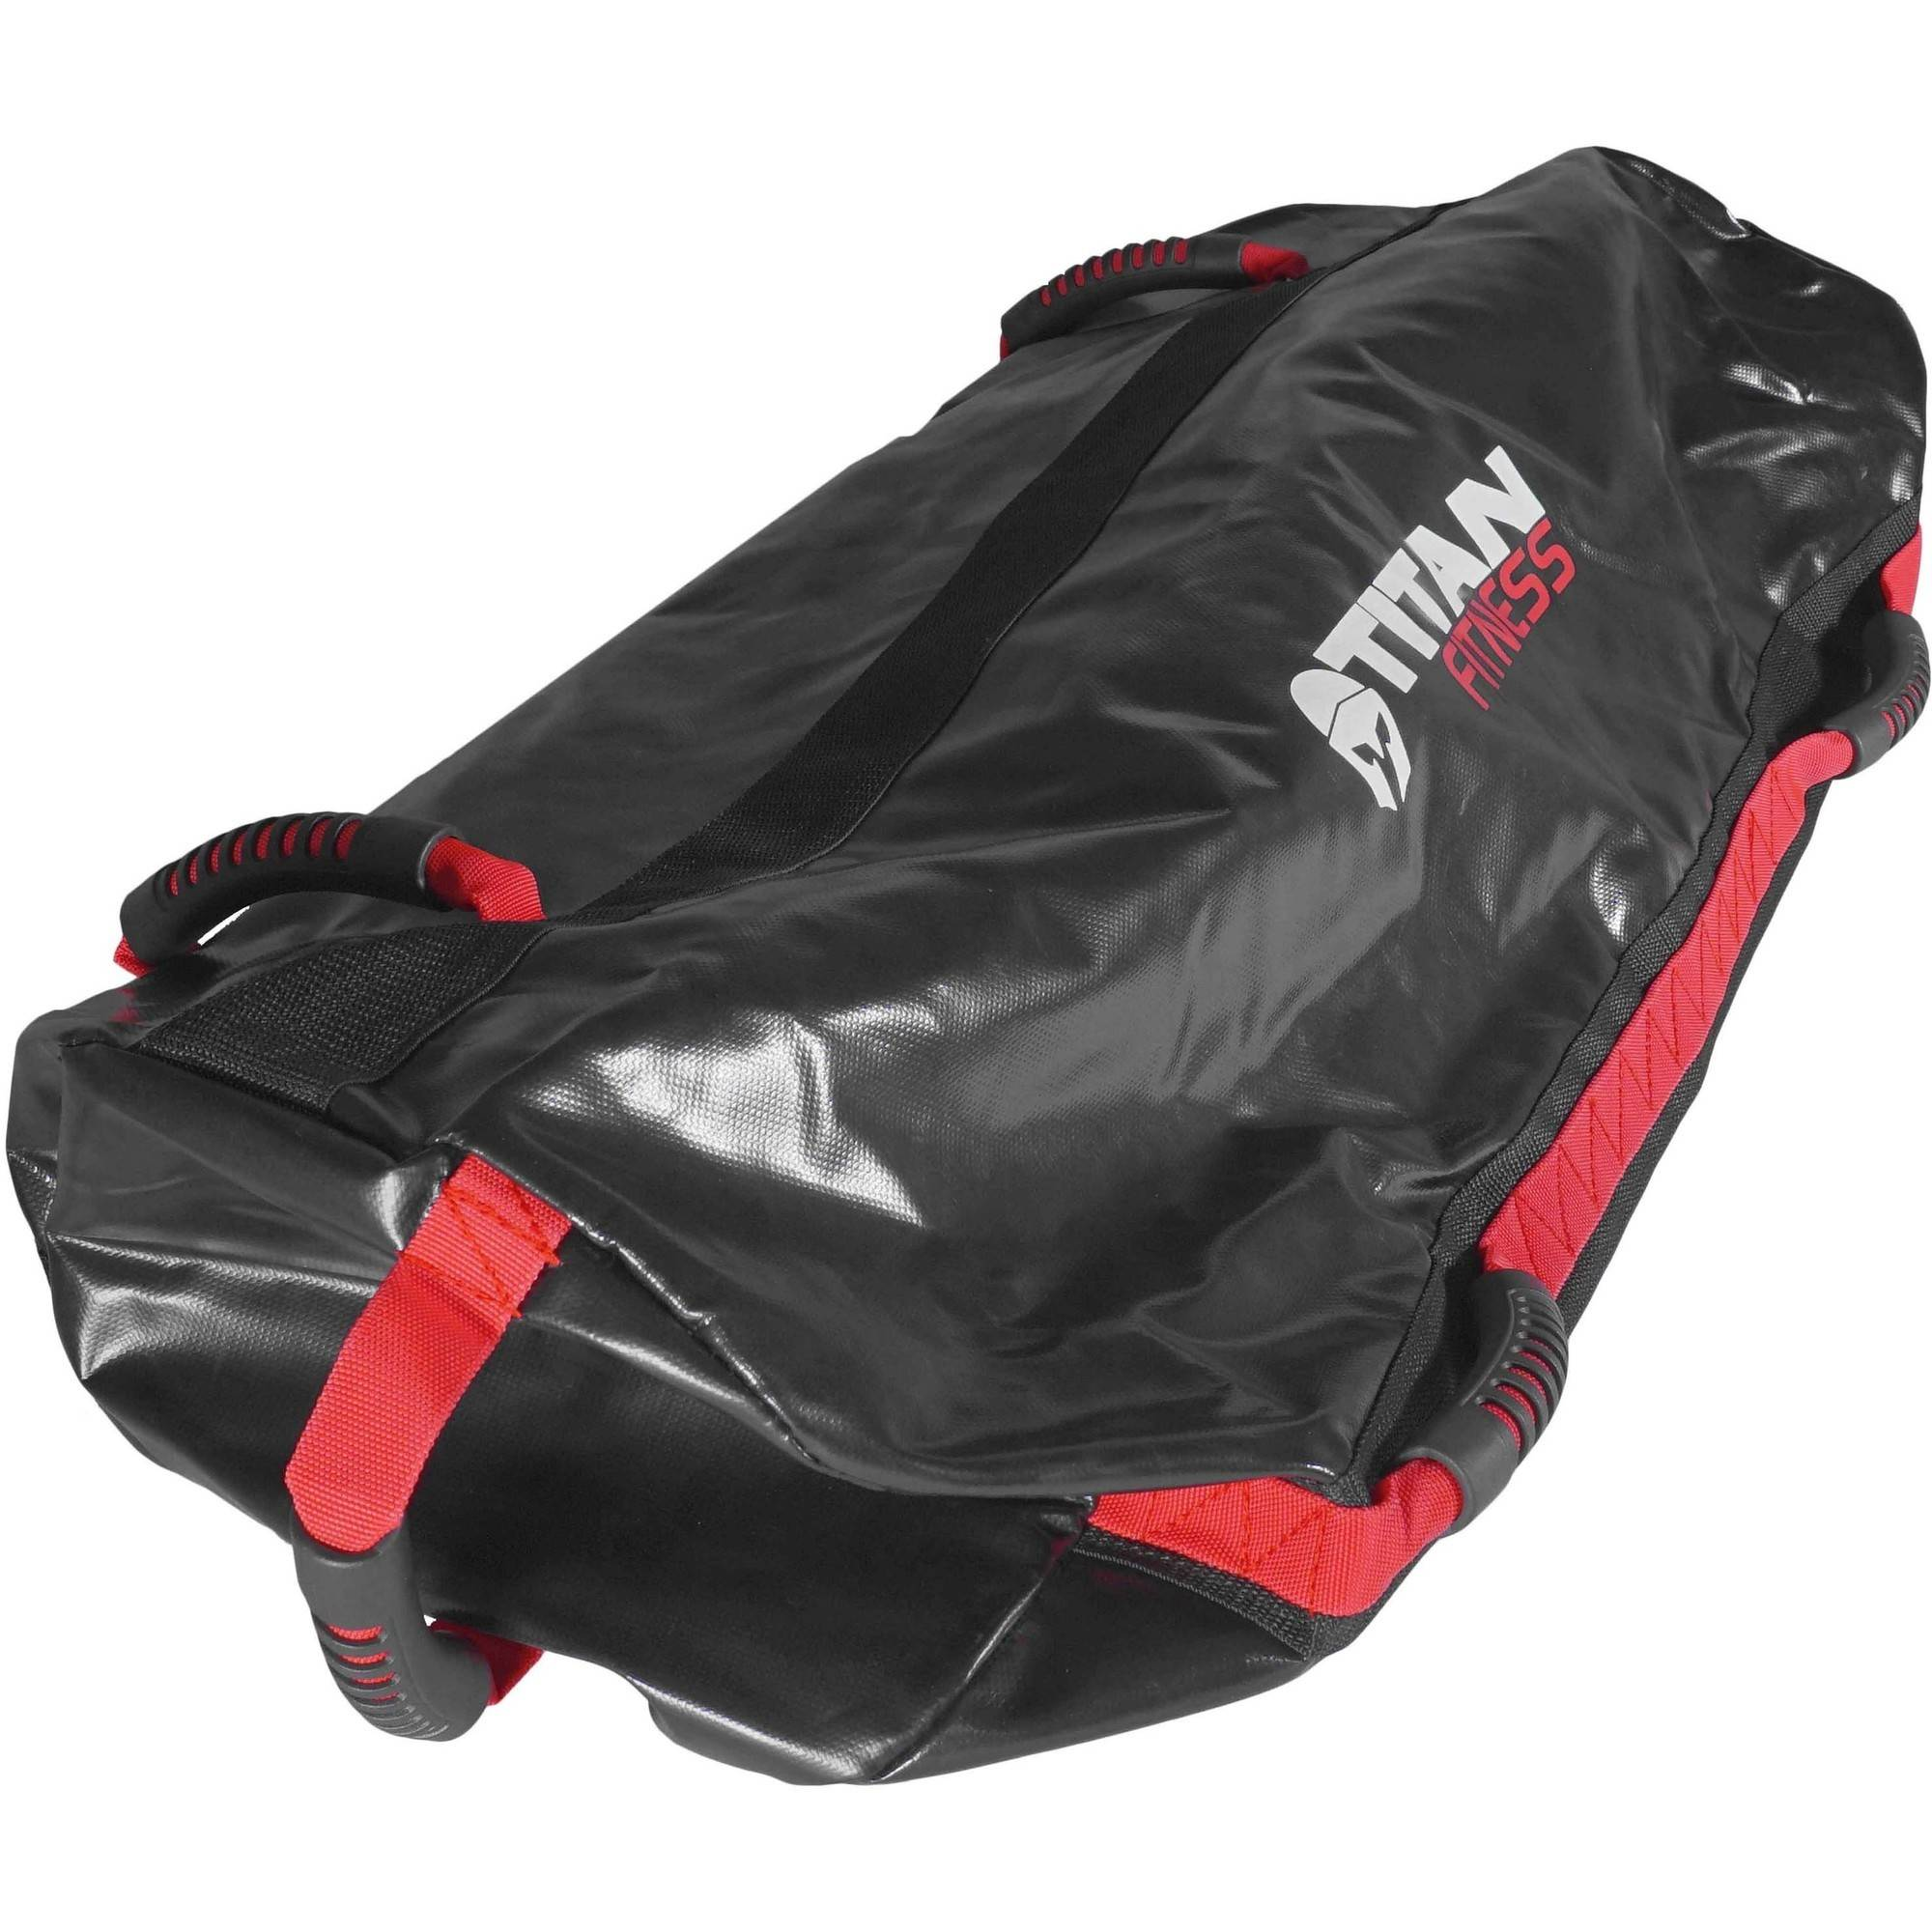 b8efde94e1d7 Titan Fitness 100 lb Heavy Duty Workout Weight Sandbag Exercise Training Bag